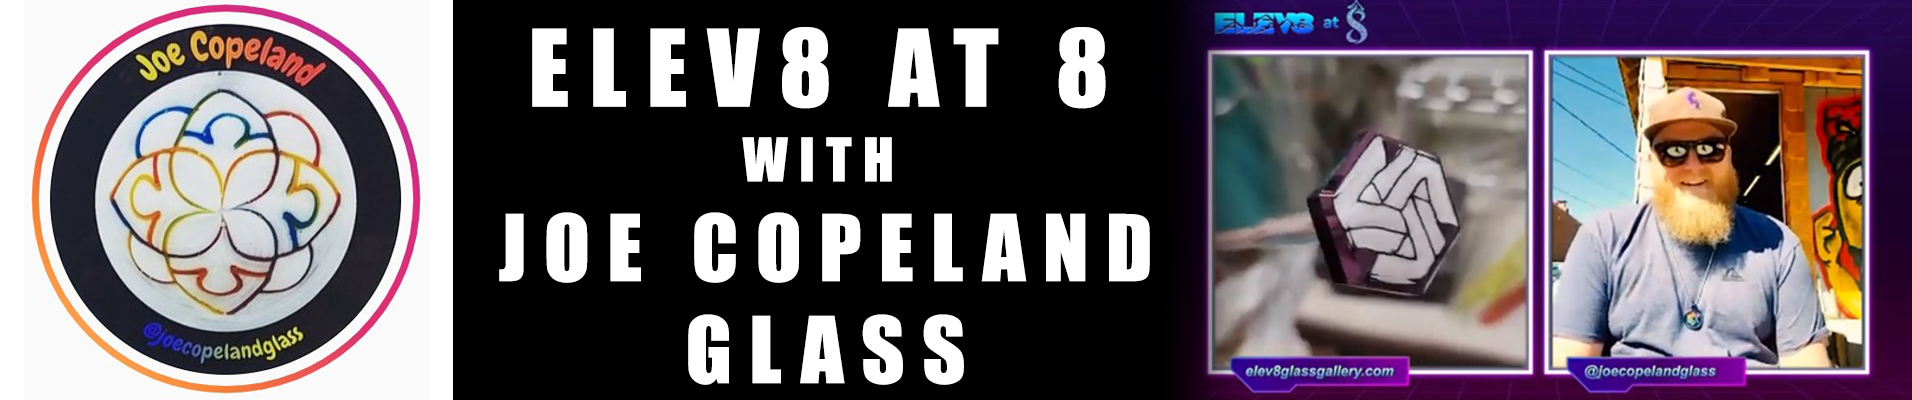 joe-copeland-elev8-at-8-blog-banner.jpg